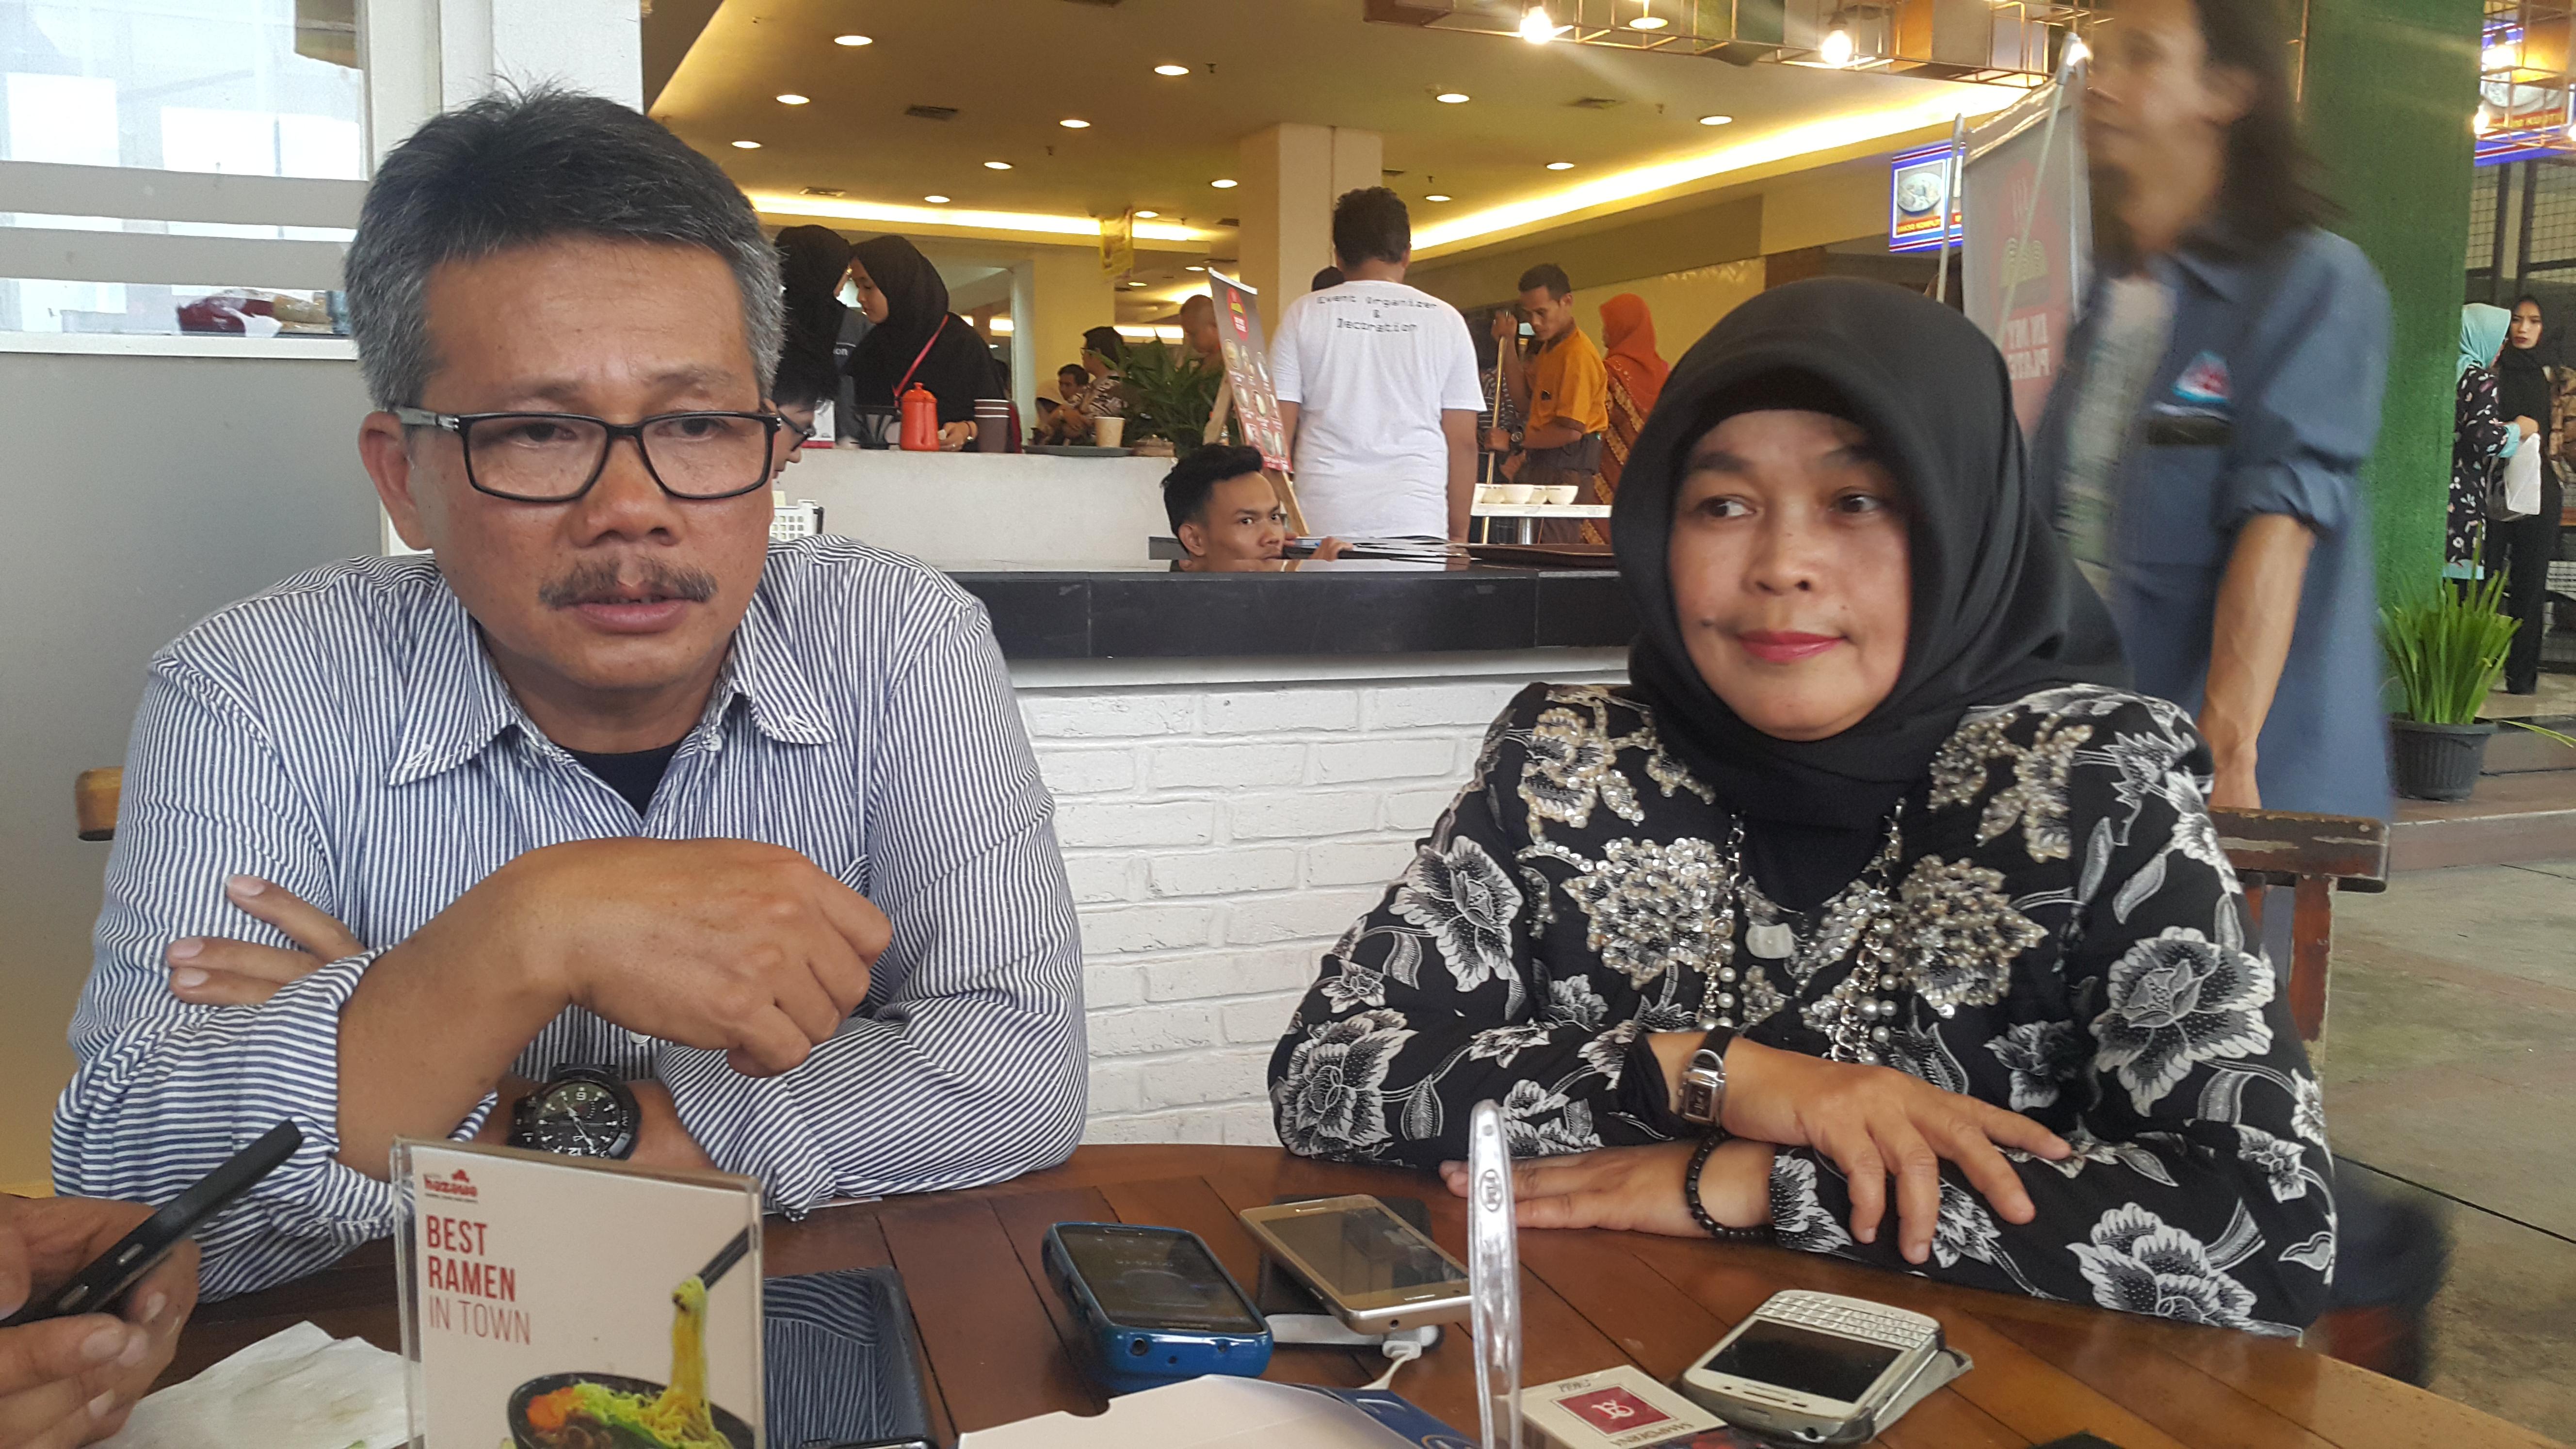 Kadis Pertanian Kab. Bandung H. Tisna Umaran di dampingi Marcomm manager Miko Mall Kopo  Dedeh Kuswandini saat di wawancara Wartawan pada acara Kopo Coffee Weeks.